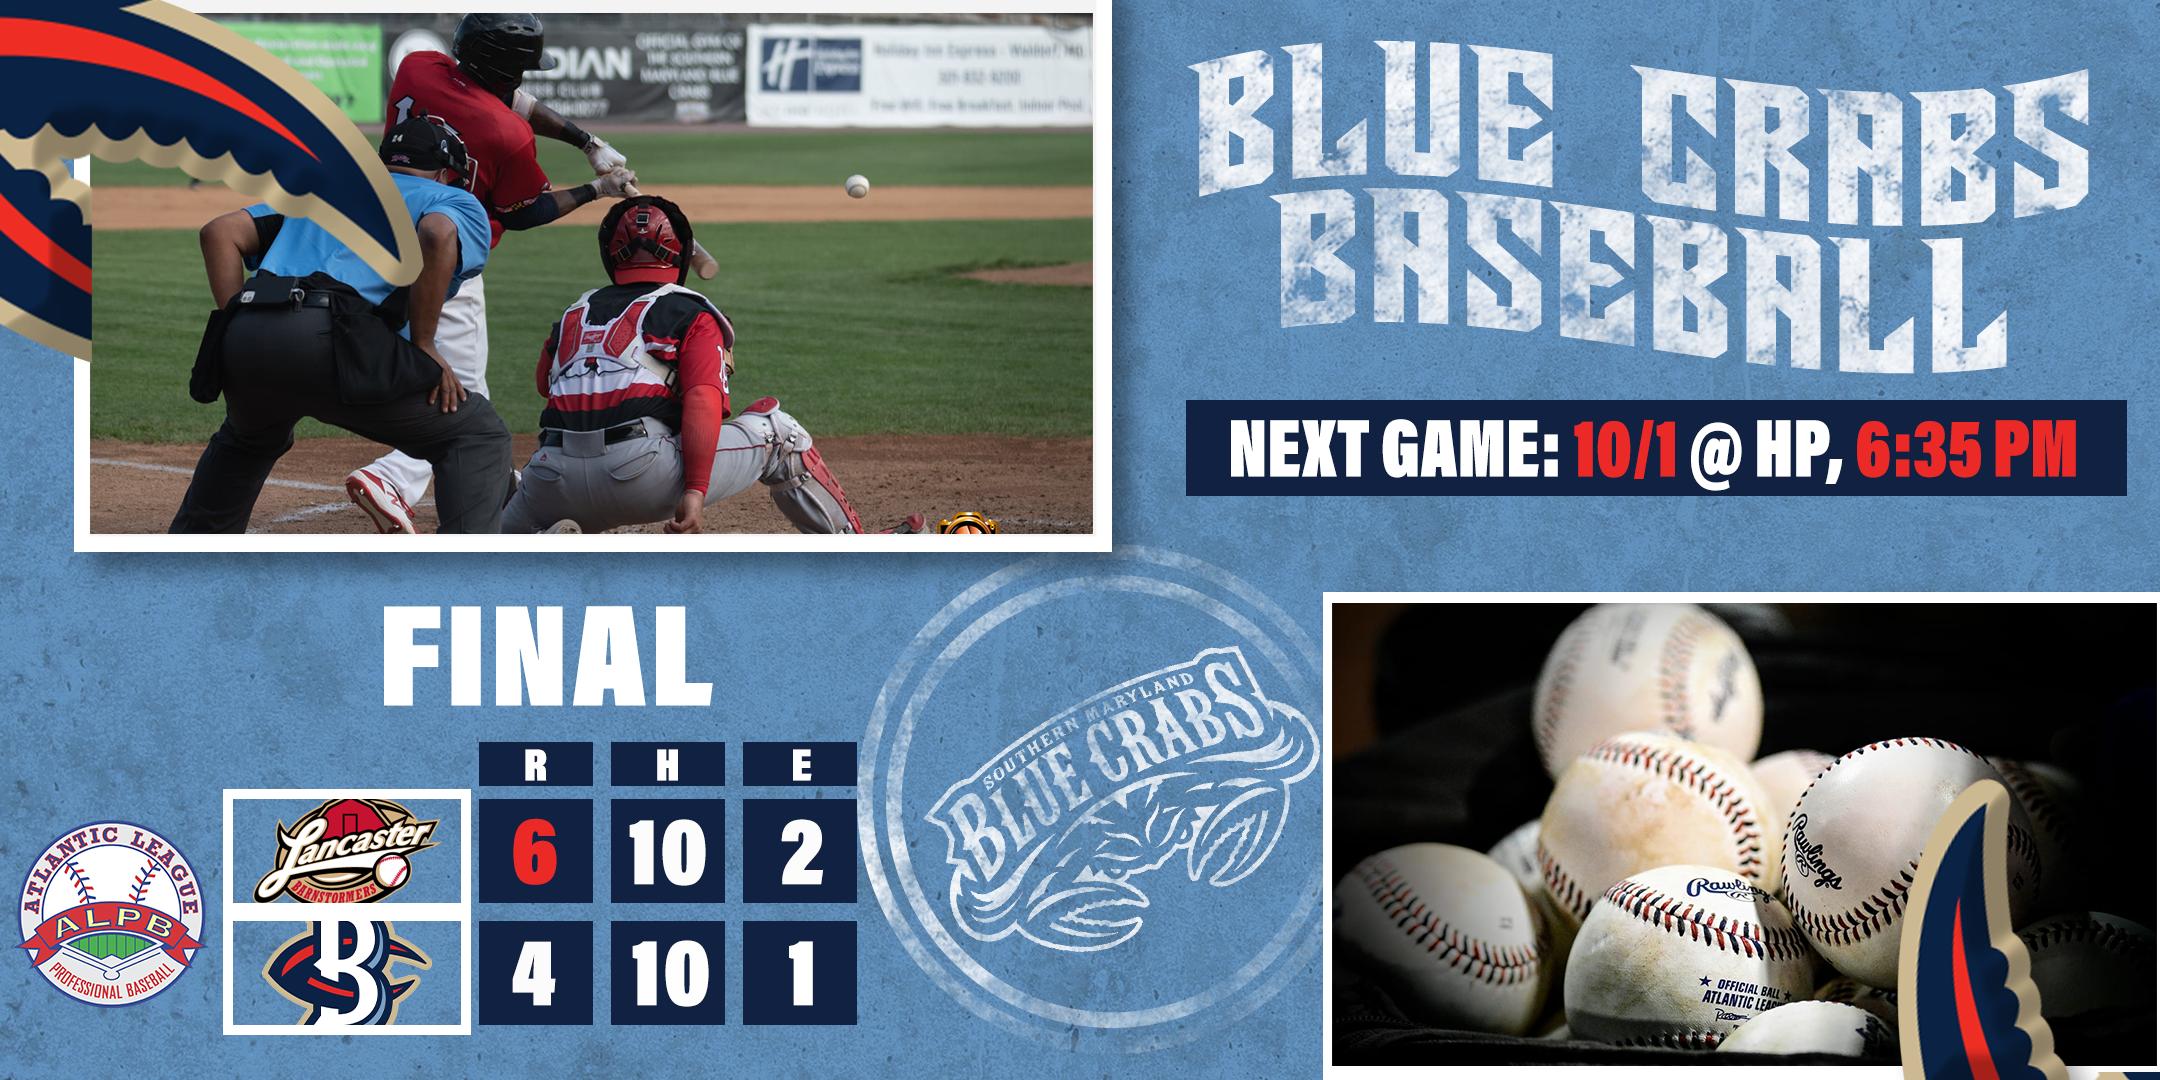 Blue Crabs Fall in Close One Versus Barnstormers 6-4 in Final Meeting